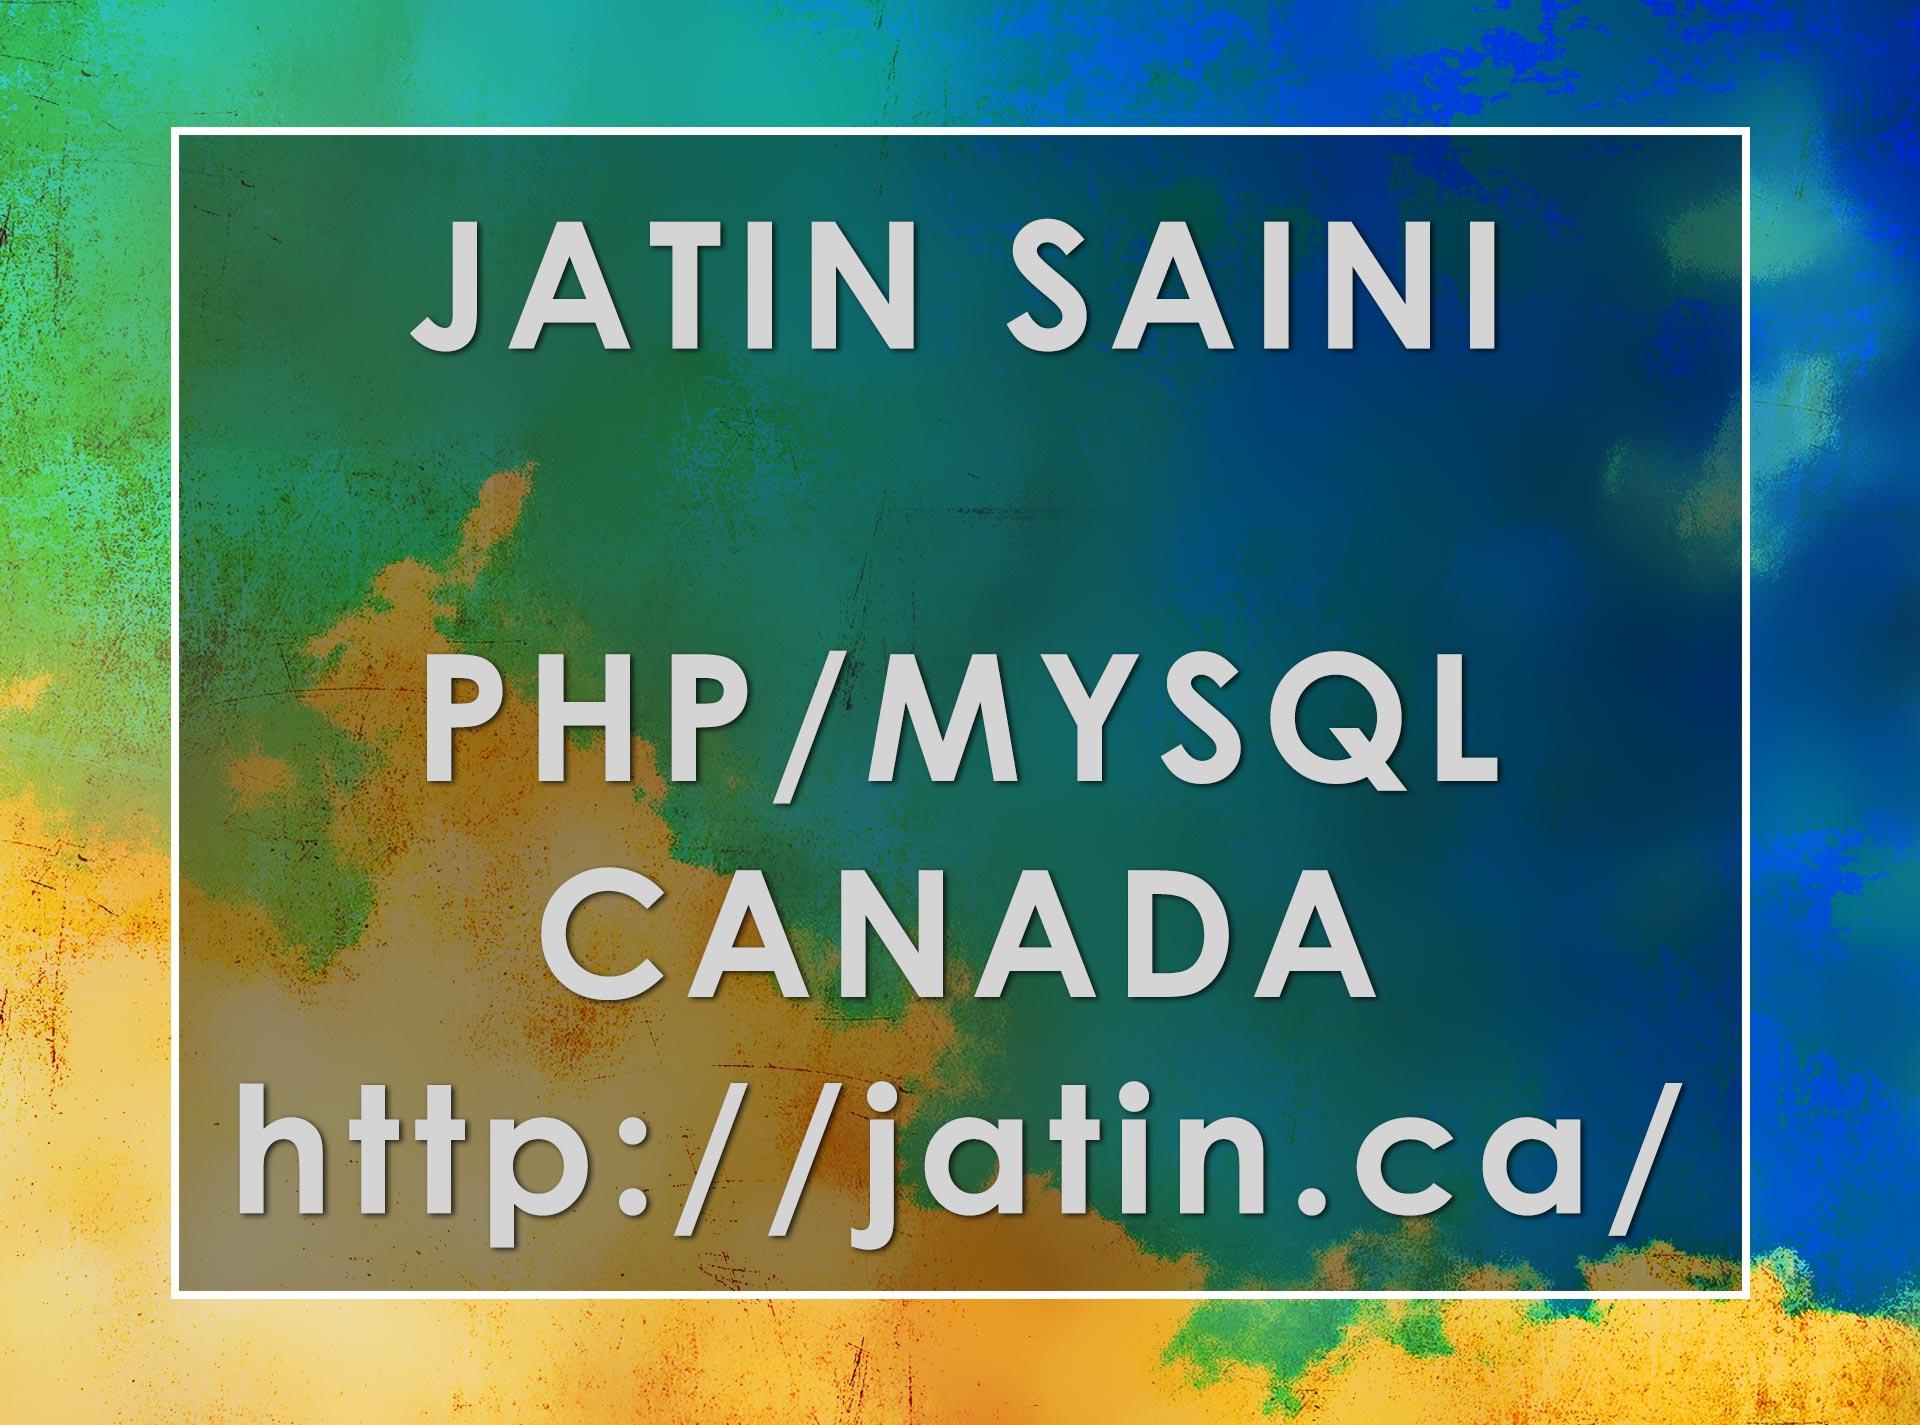 Search Engine Specialist Jatin Saini